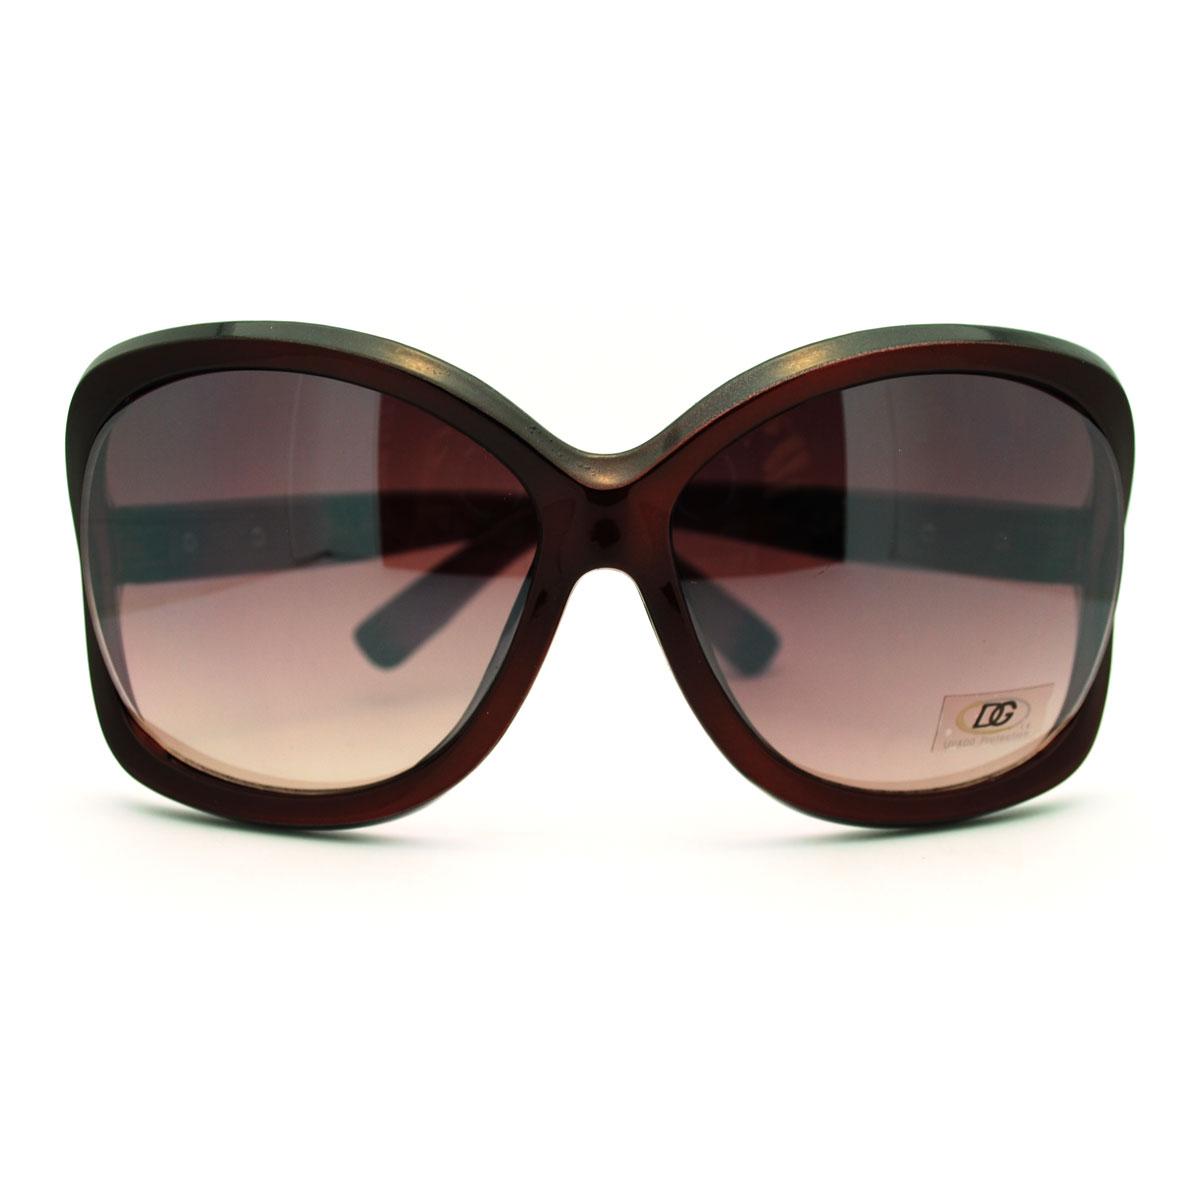 Fashion sunglasses online store 6